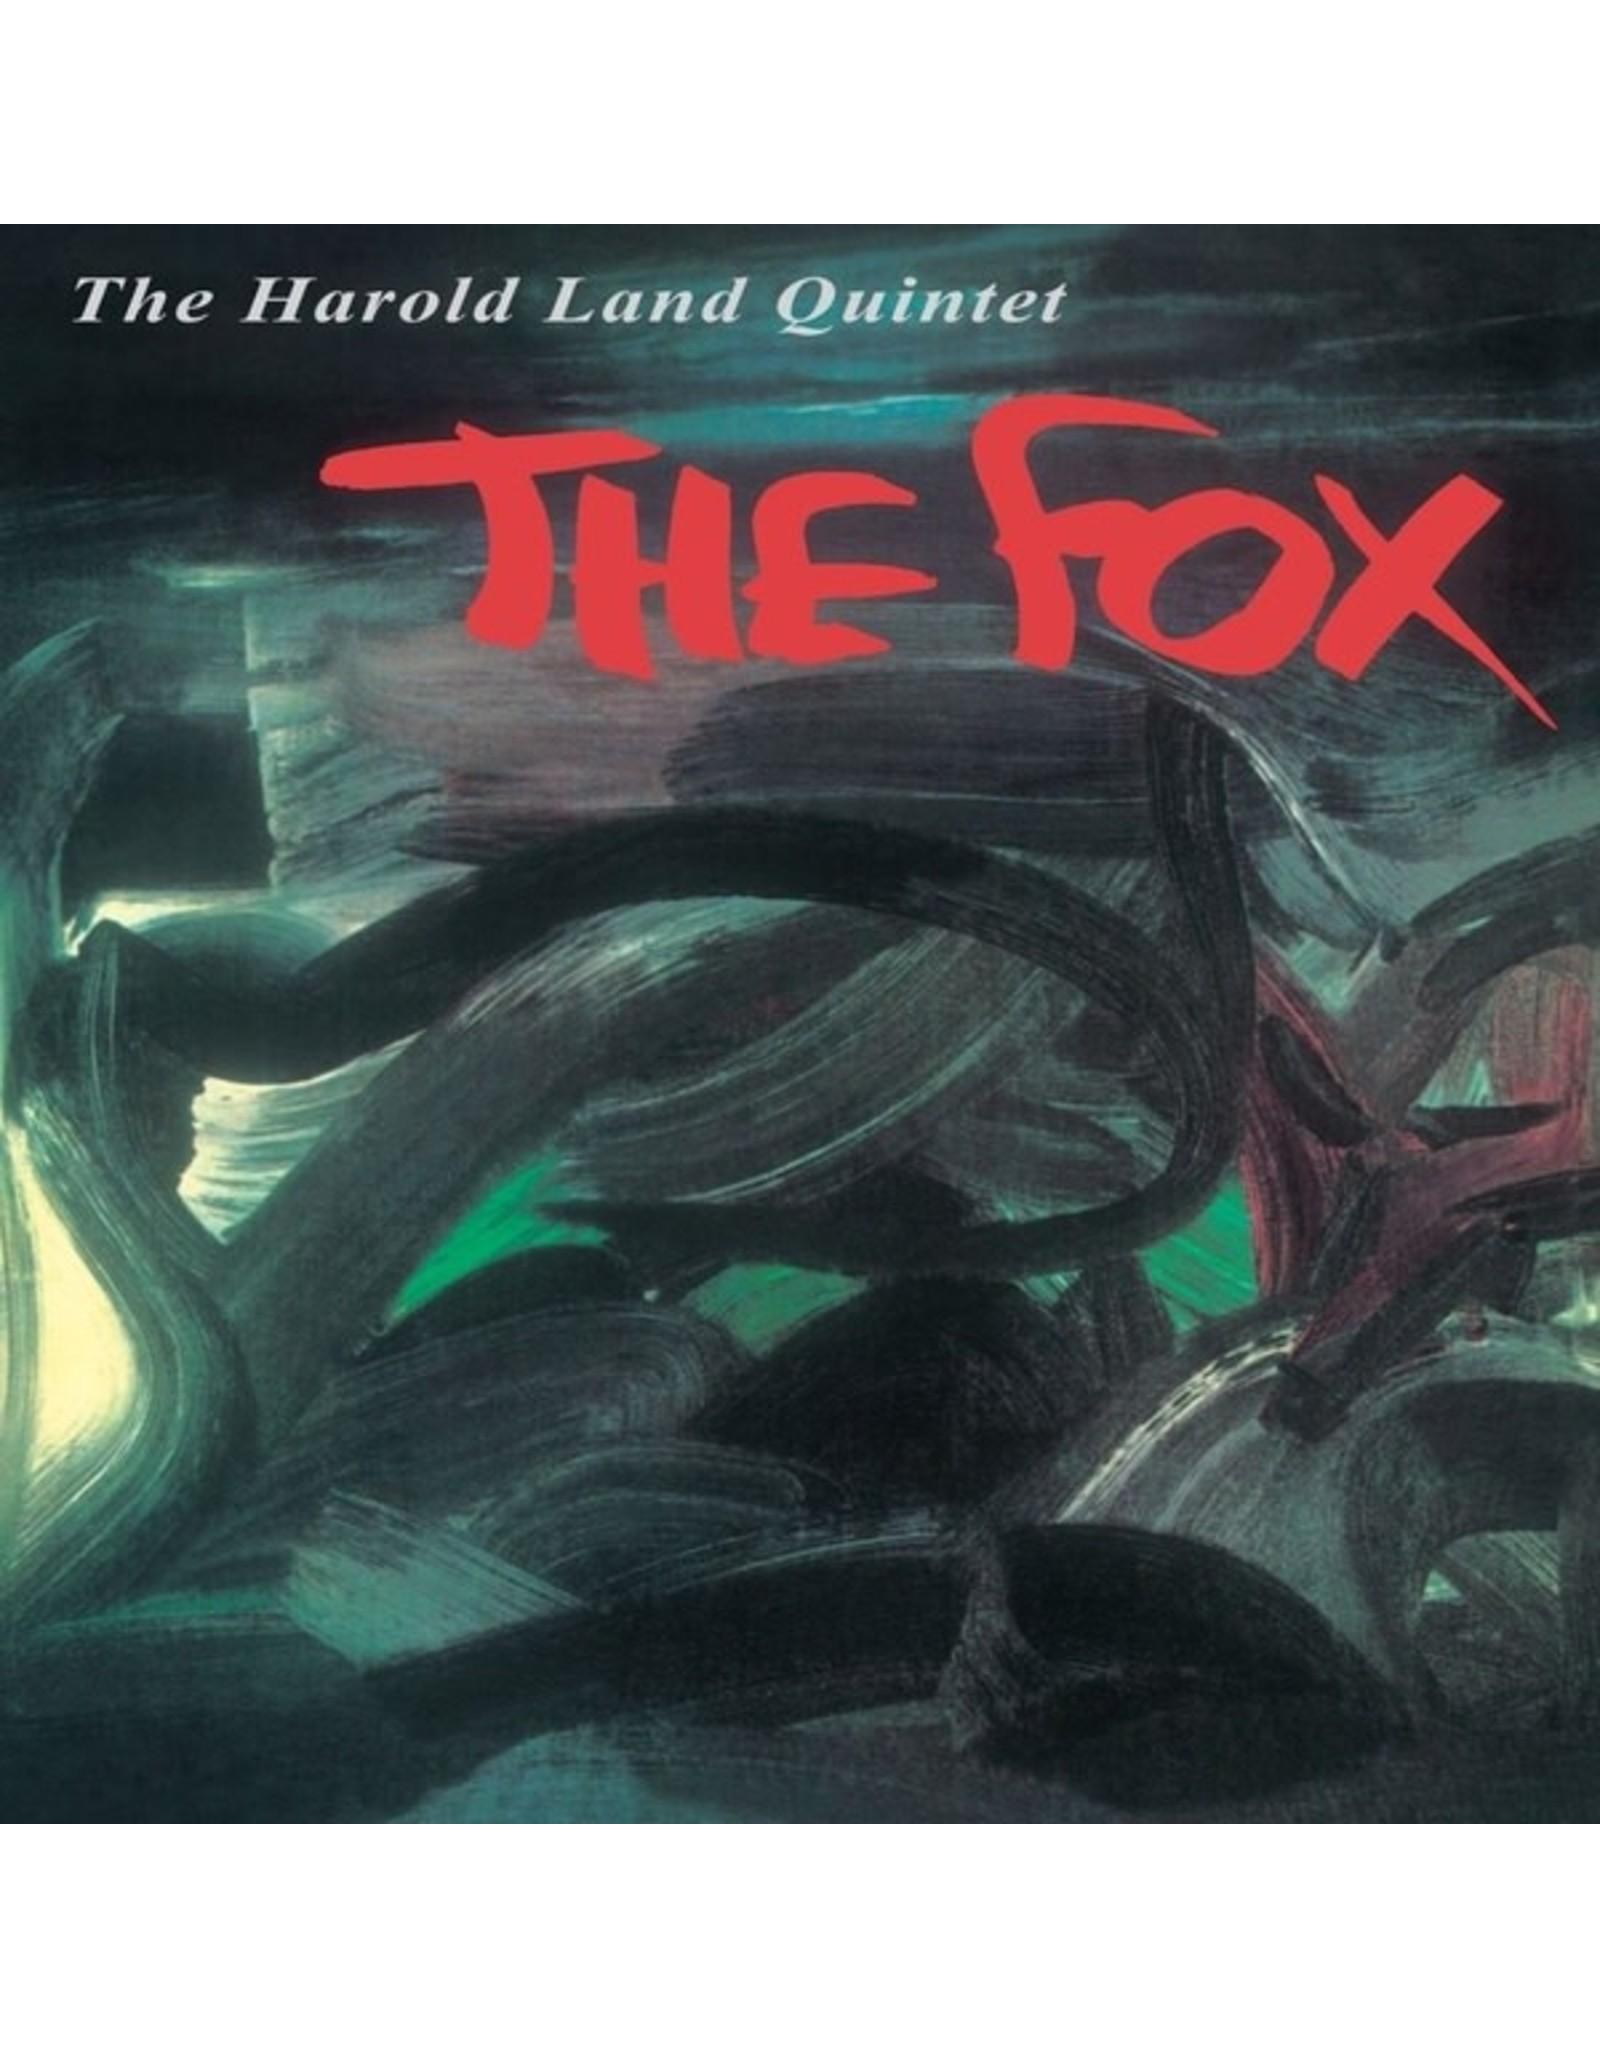 New Vinyl The Harold Land Quintet - The Fox LP